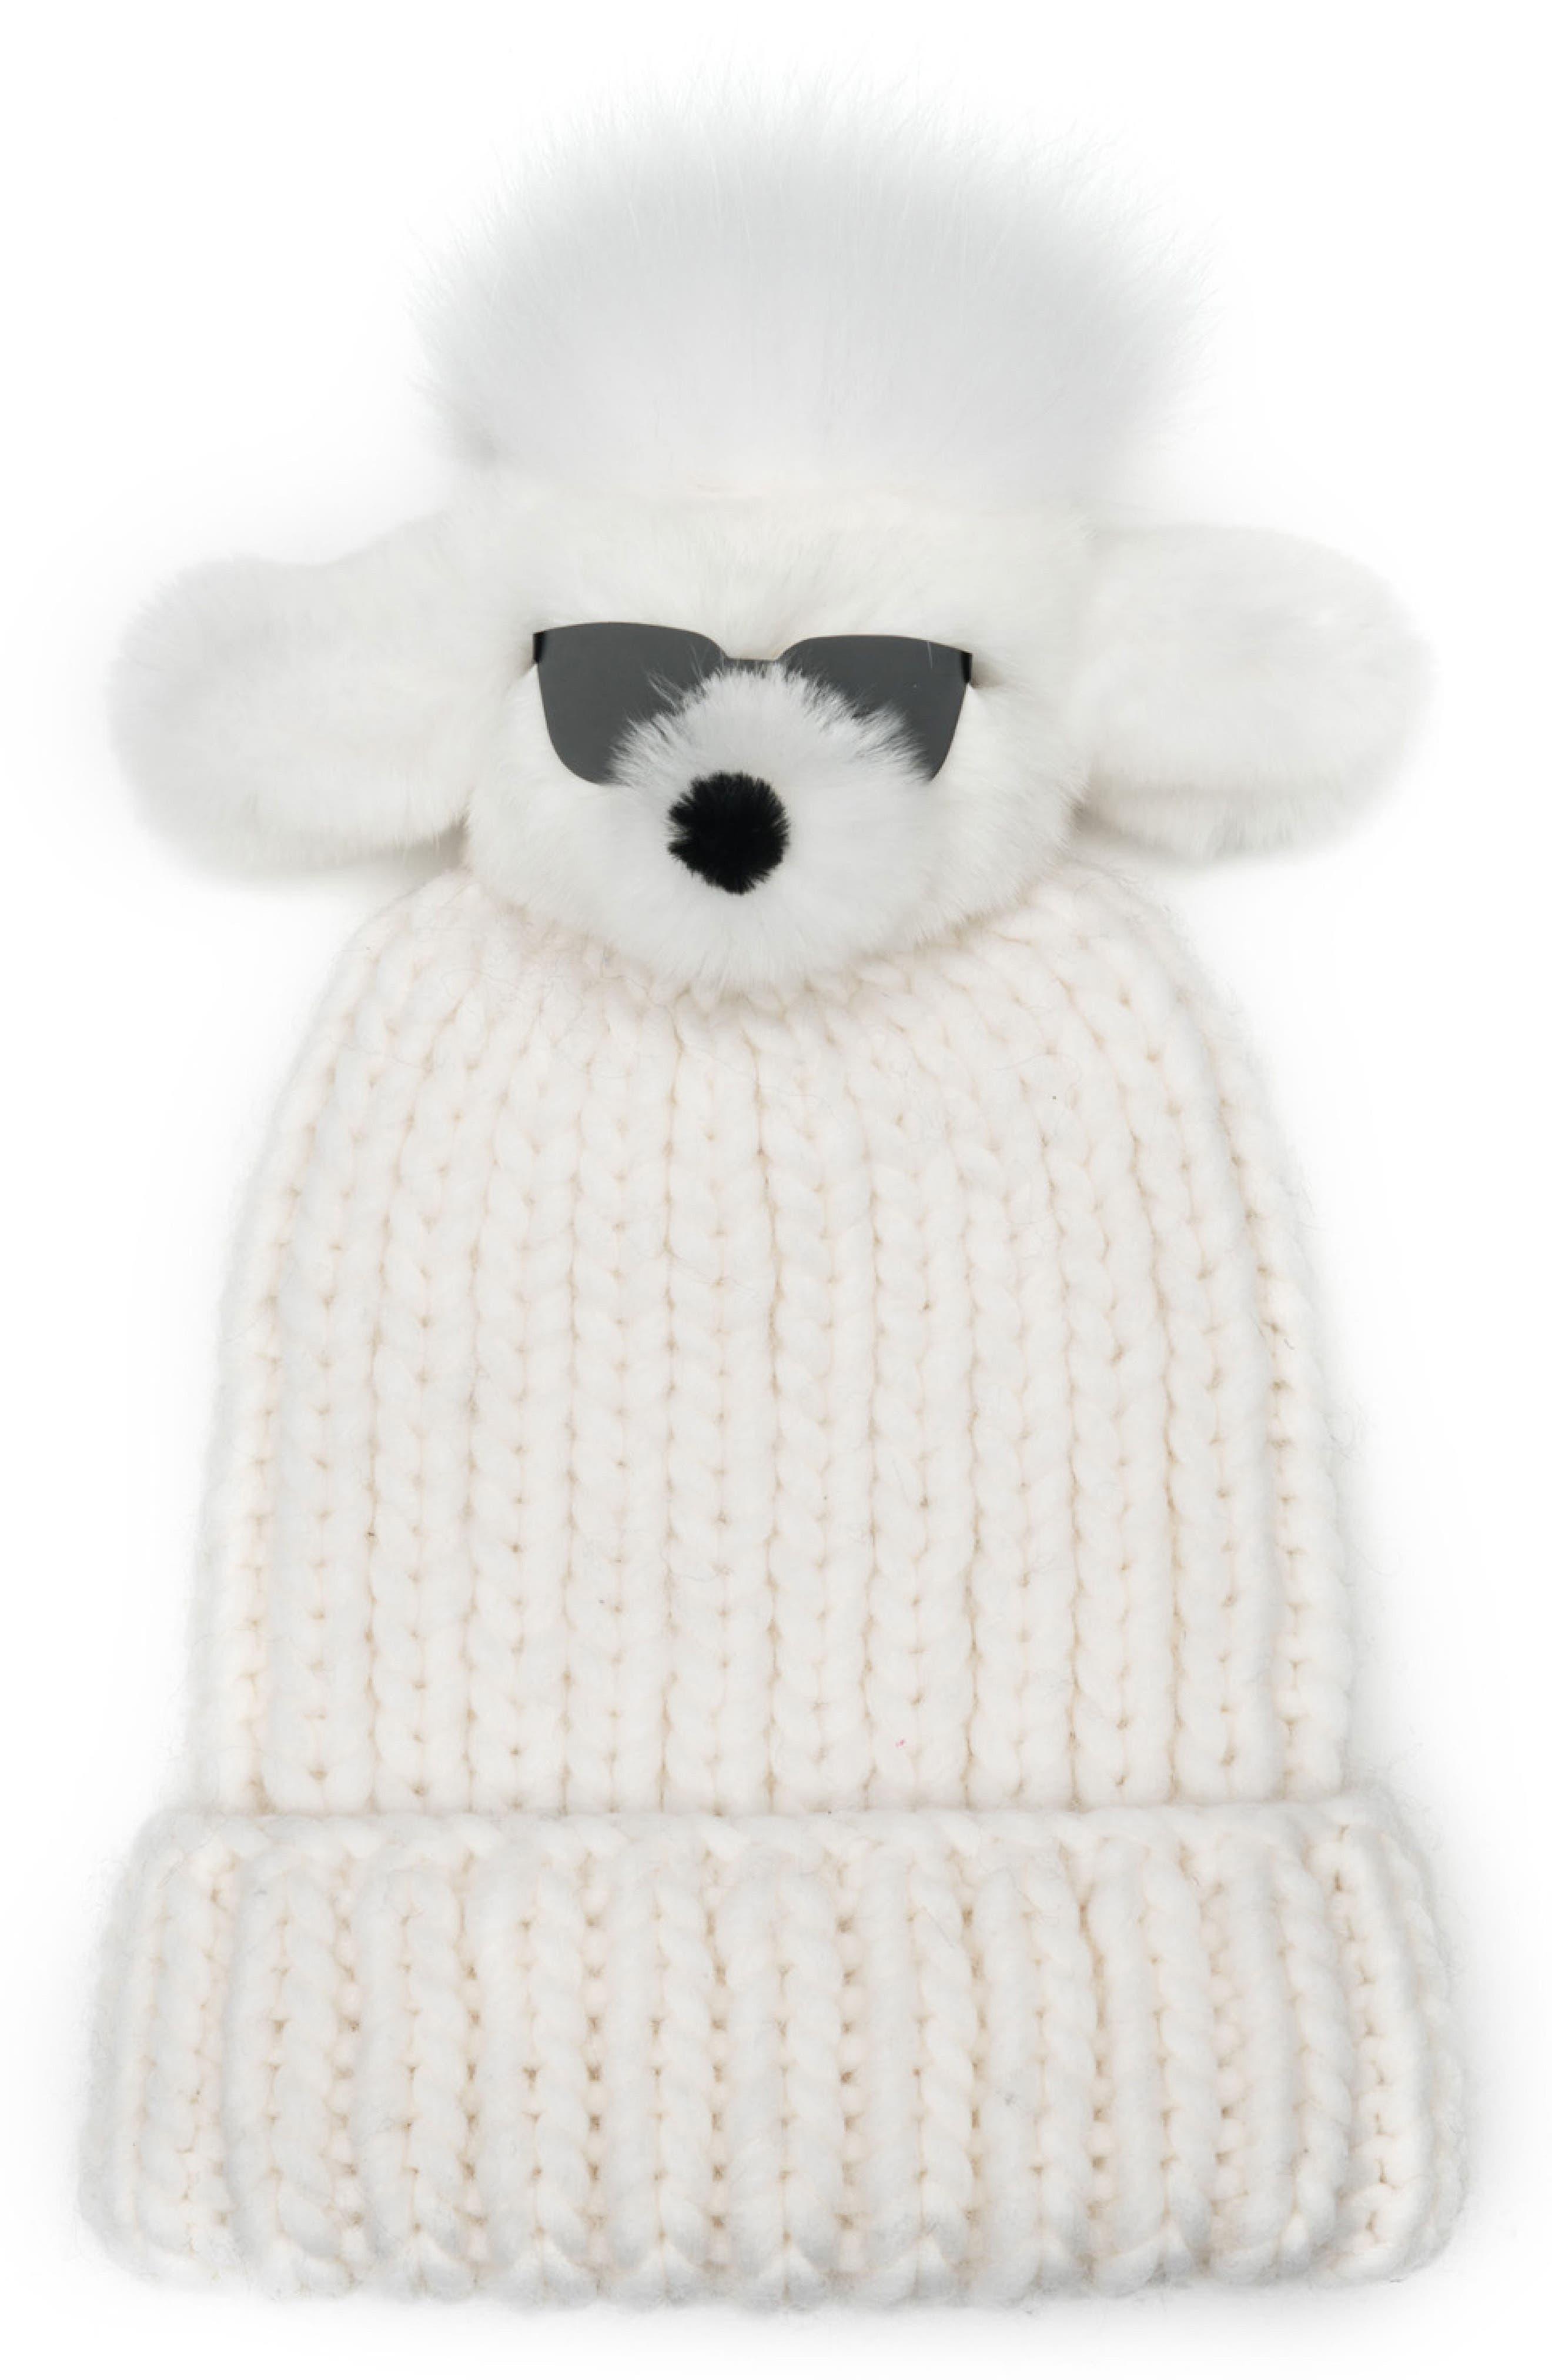 Rain Wool Stocking Cap with Genuine Fox Fur Pom,                         Main,                         color, White